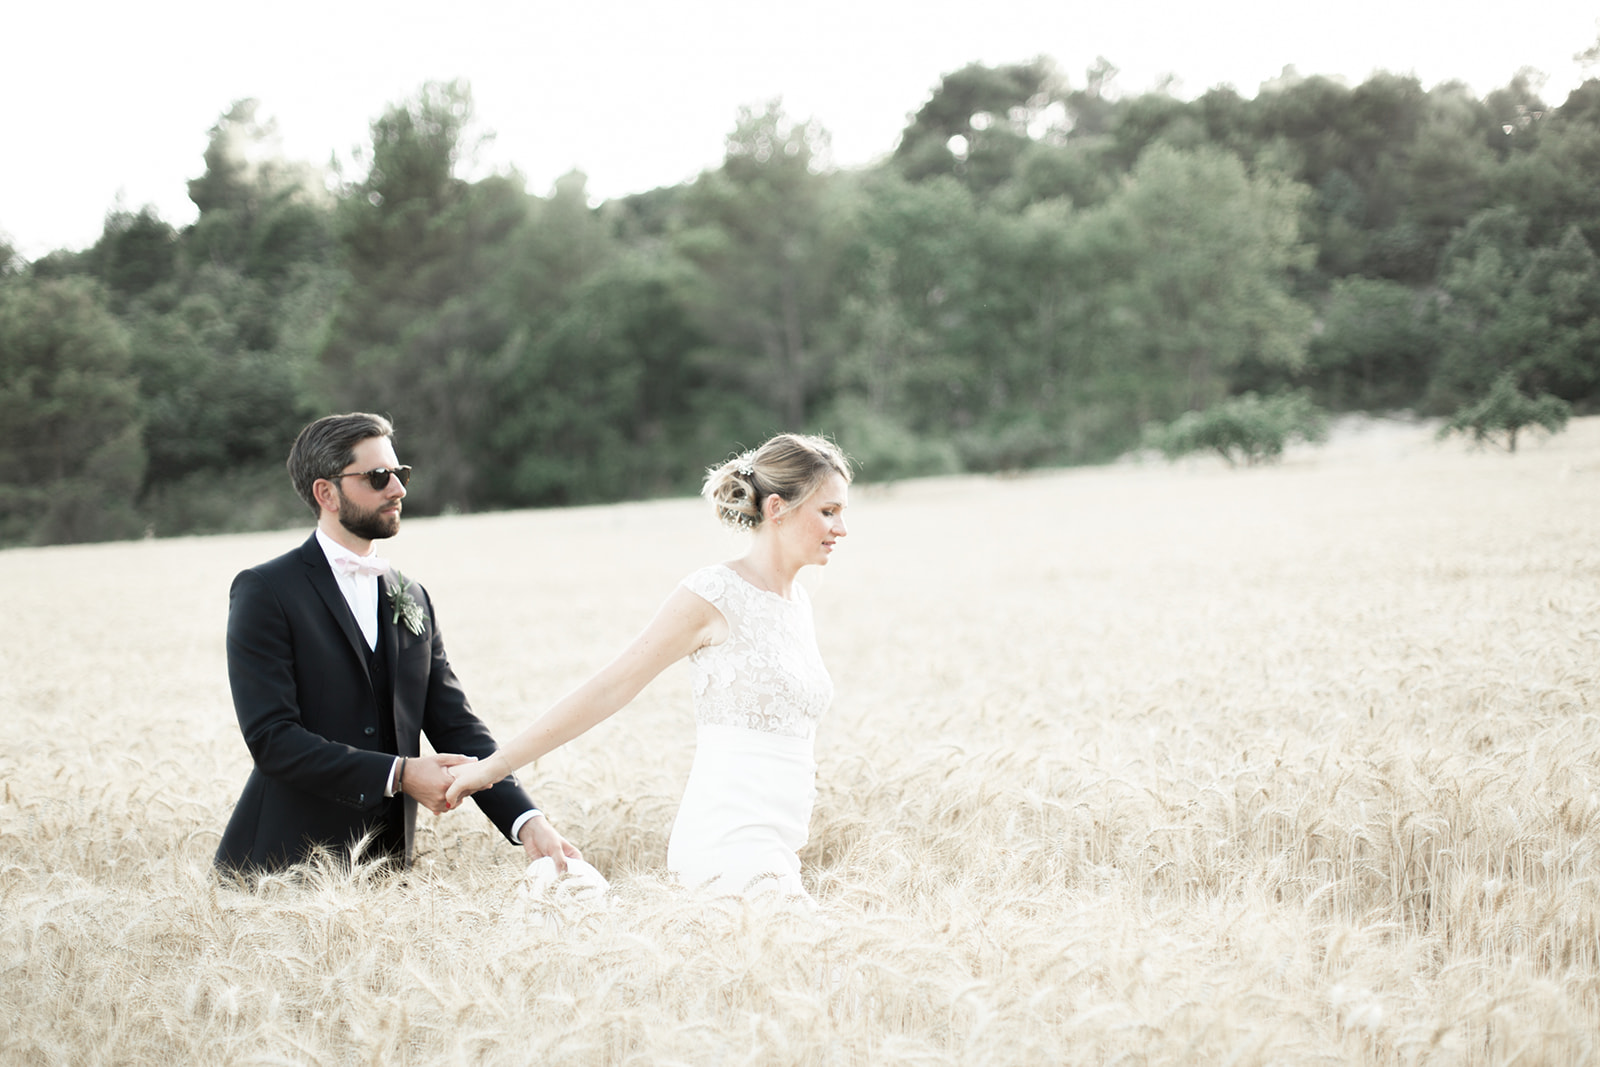 wedding-provence-106.jpg